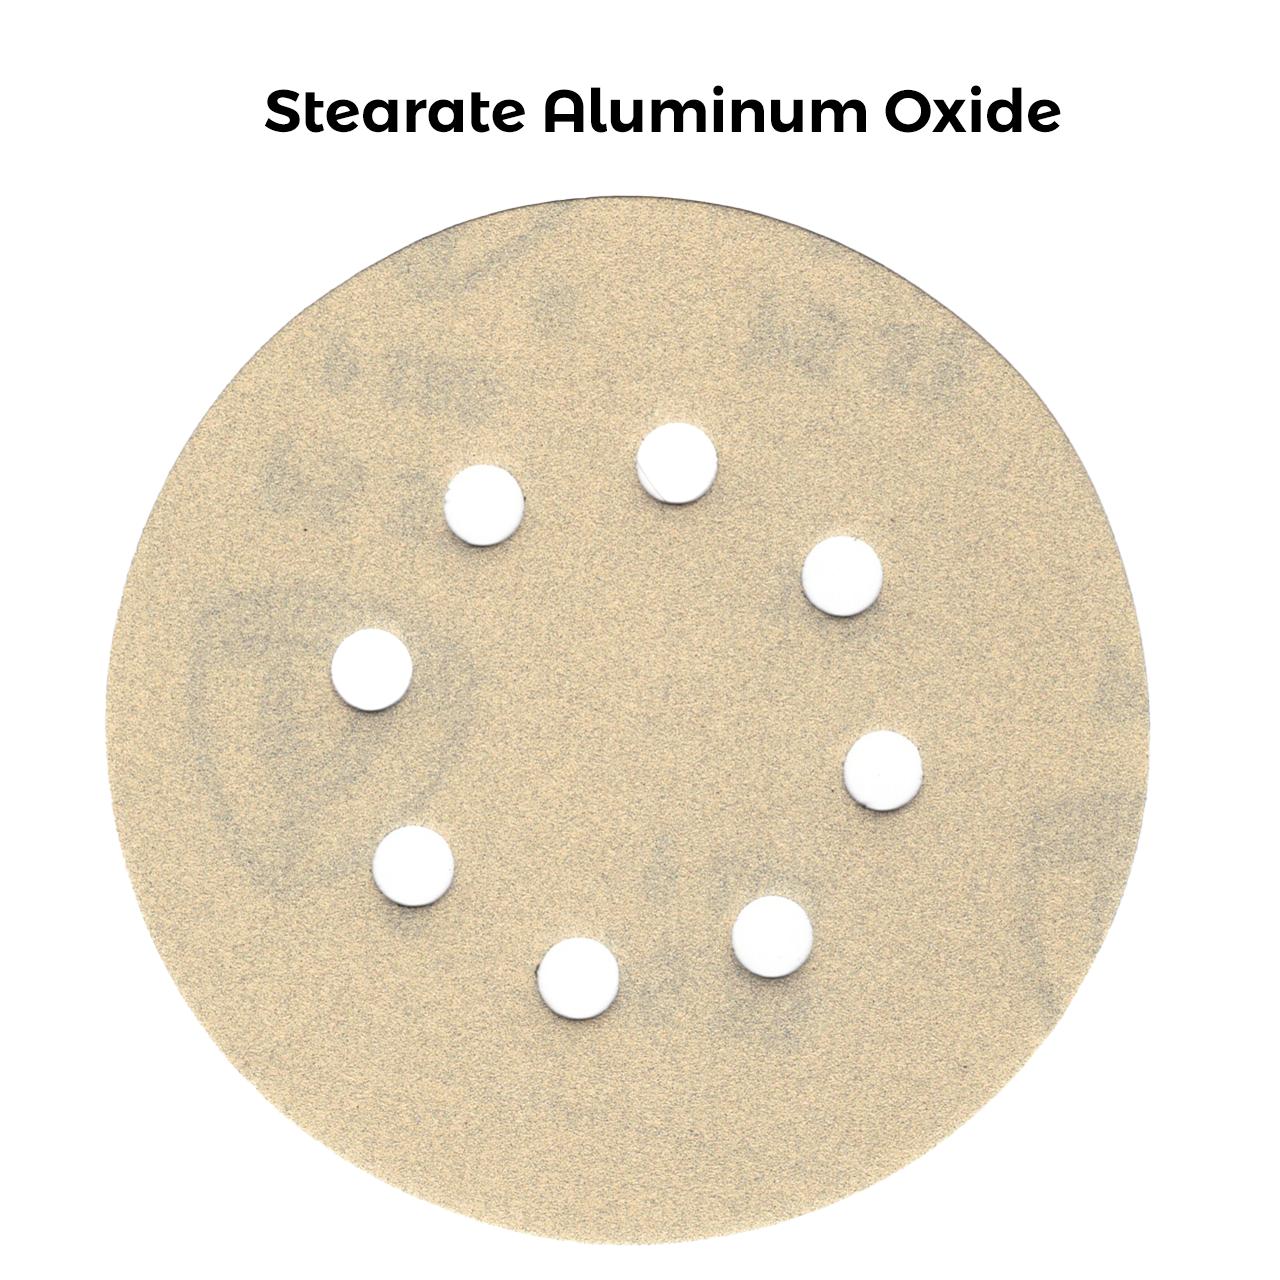 Klingspor Abrasives 5 Inch X 8 Hole Stearate Aluminum Oxide Discs